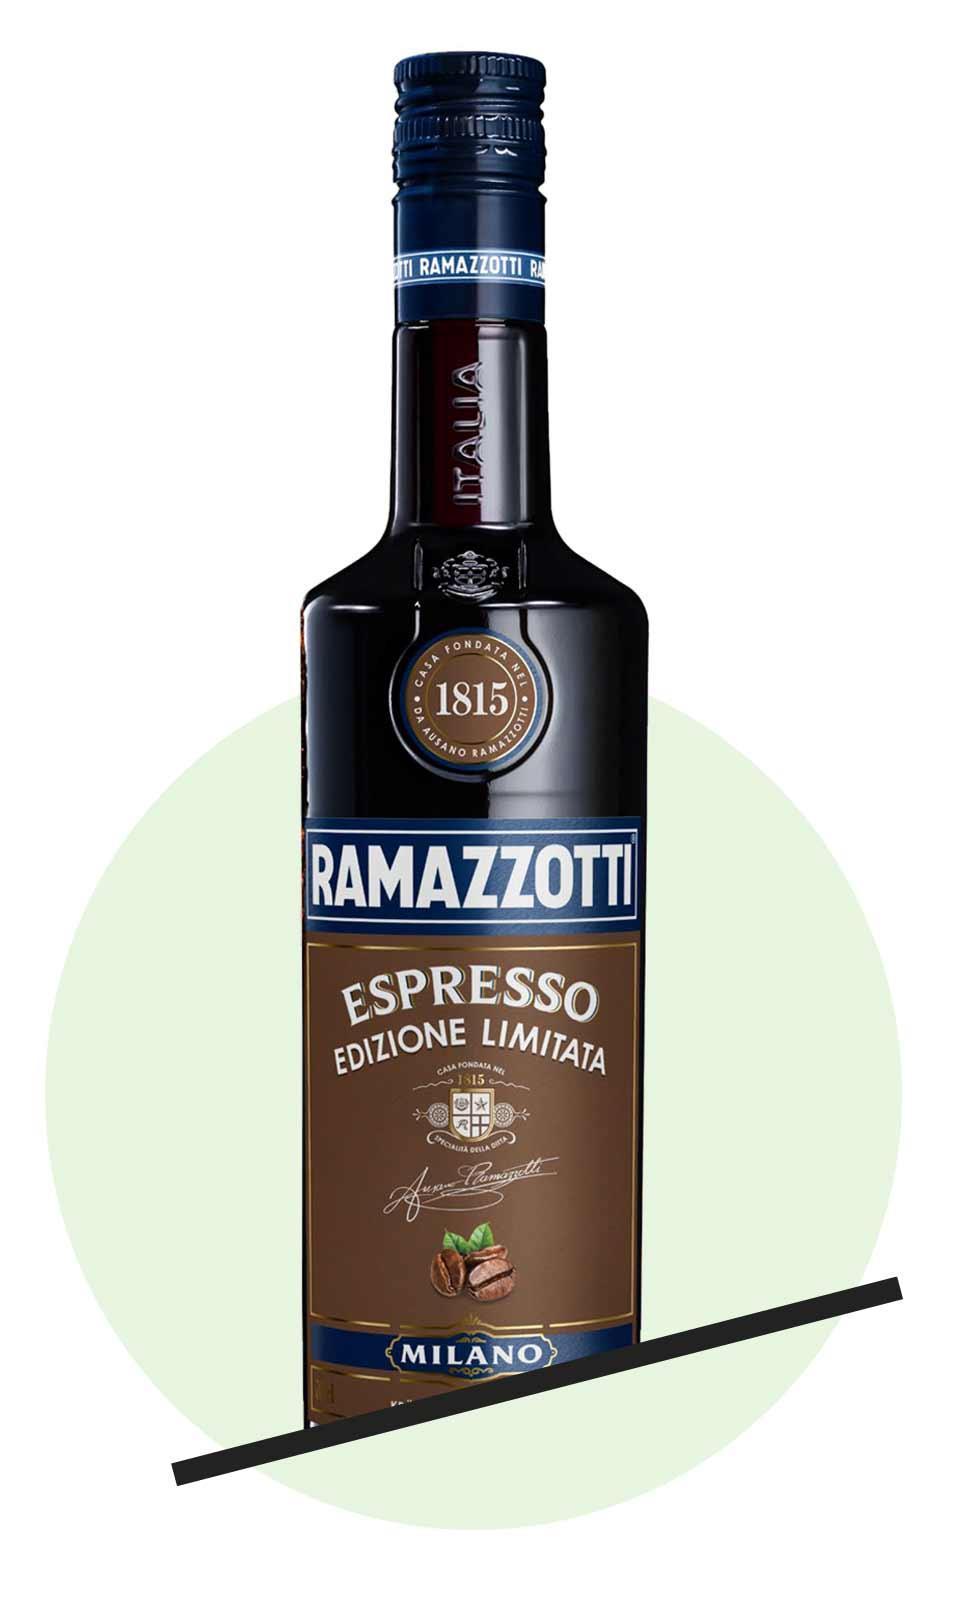 Ramazotti Espresso Limitata | Verkostungsrunde Spirituosen April 2019 | Mixology Magazin für Barkultur